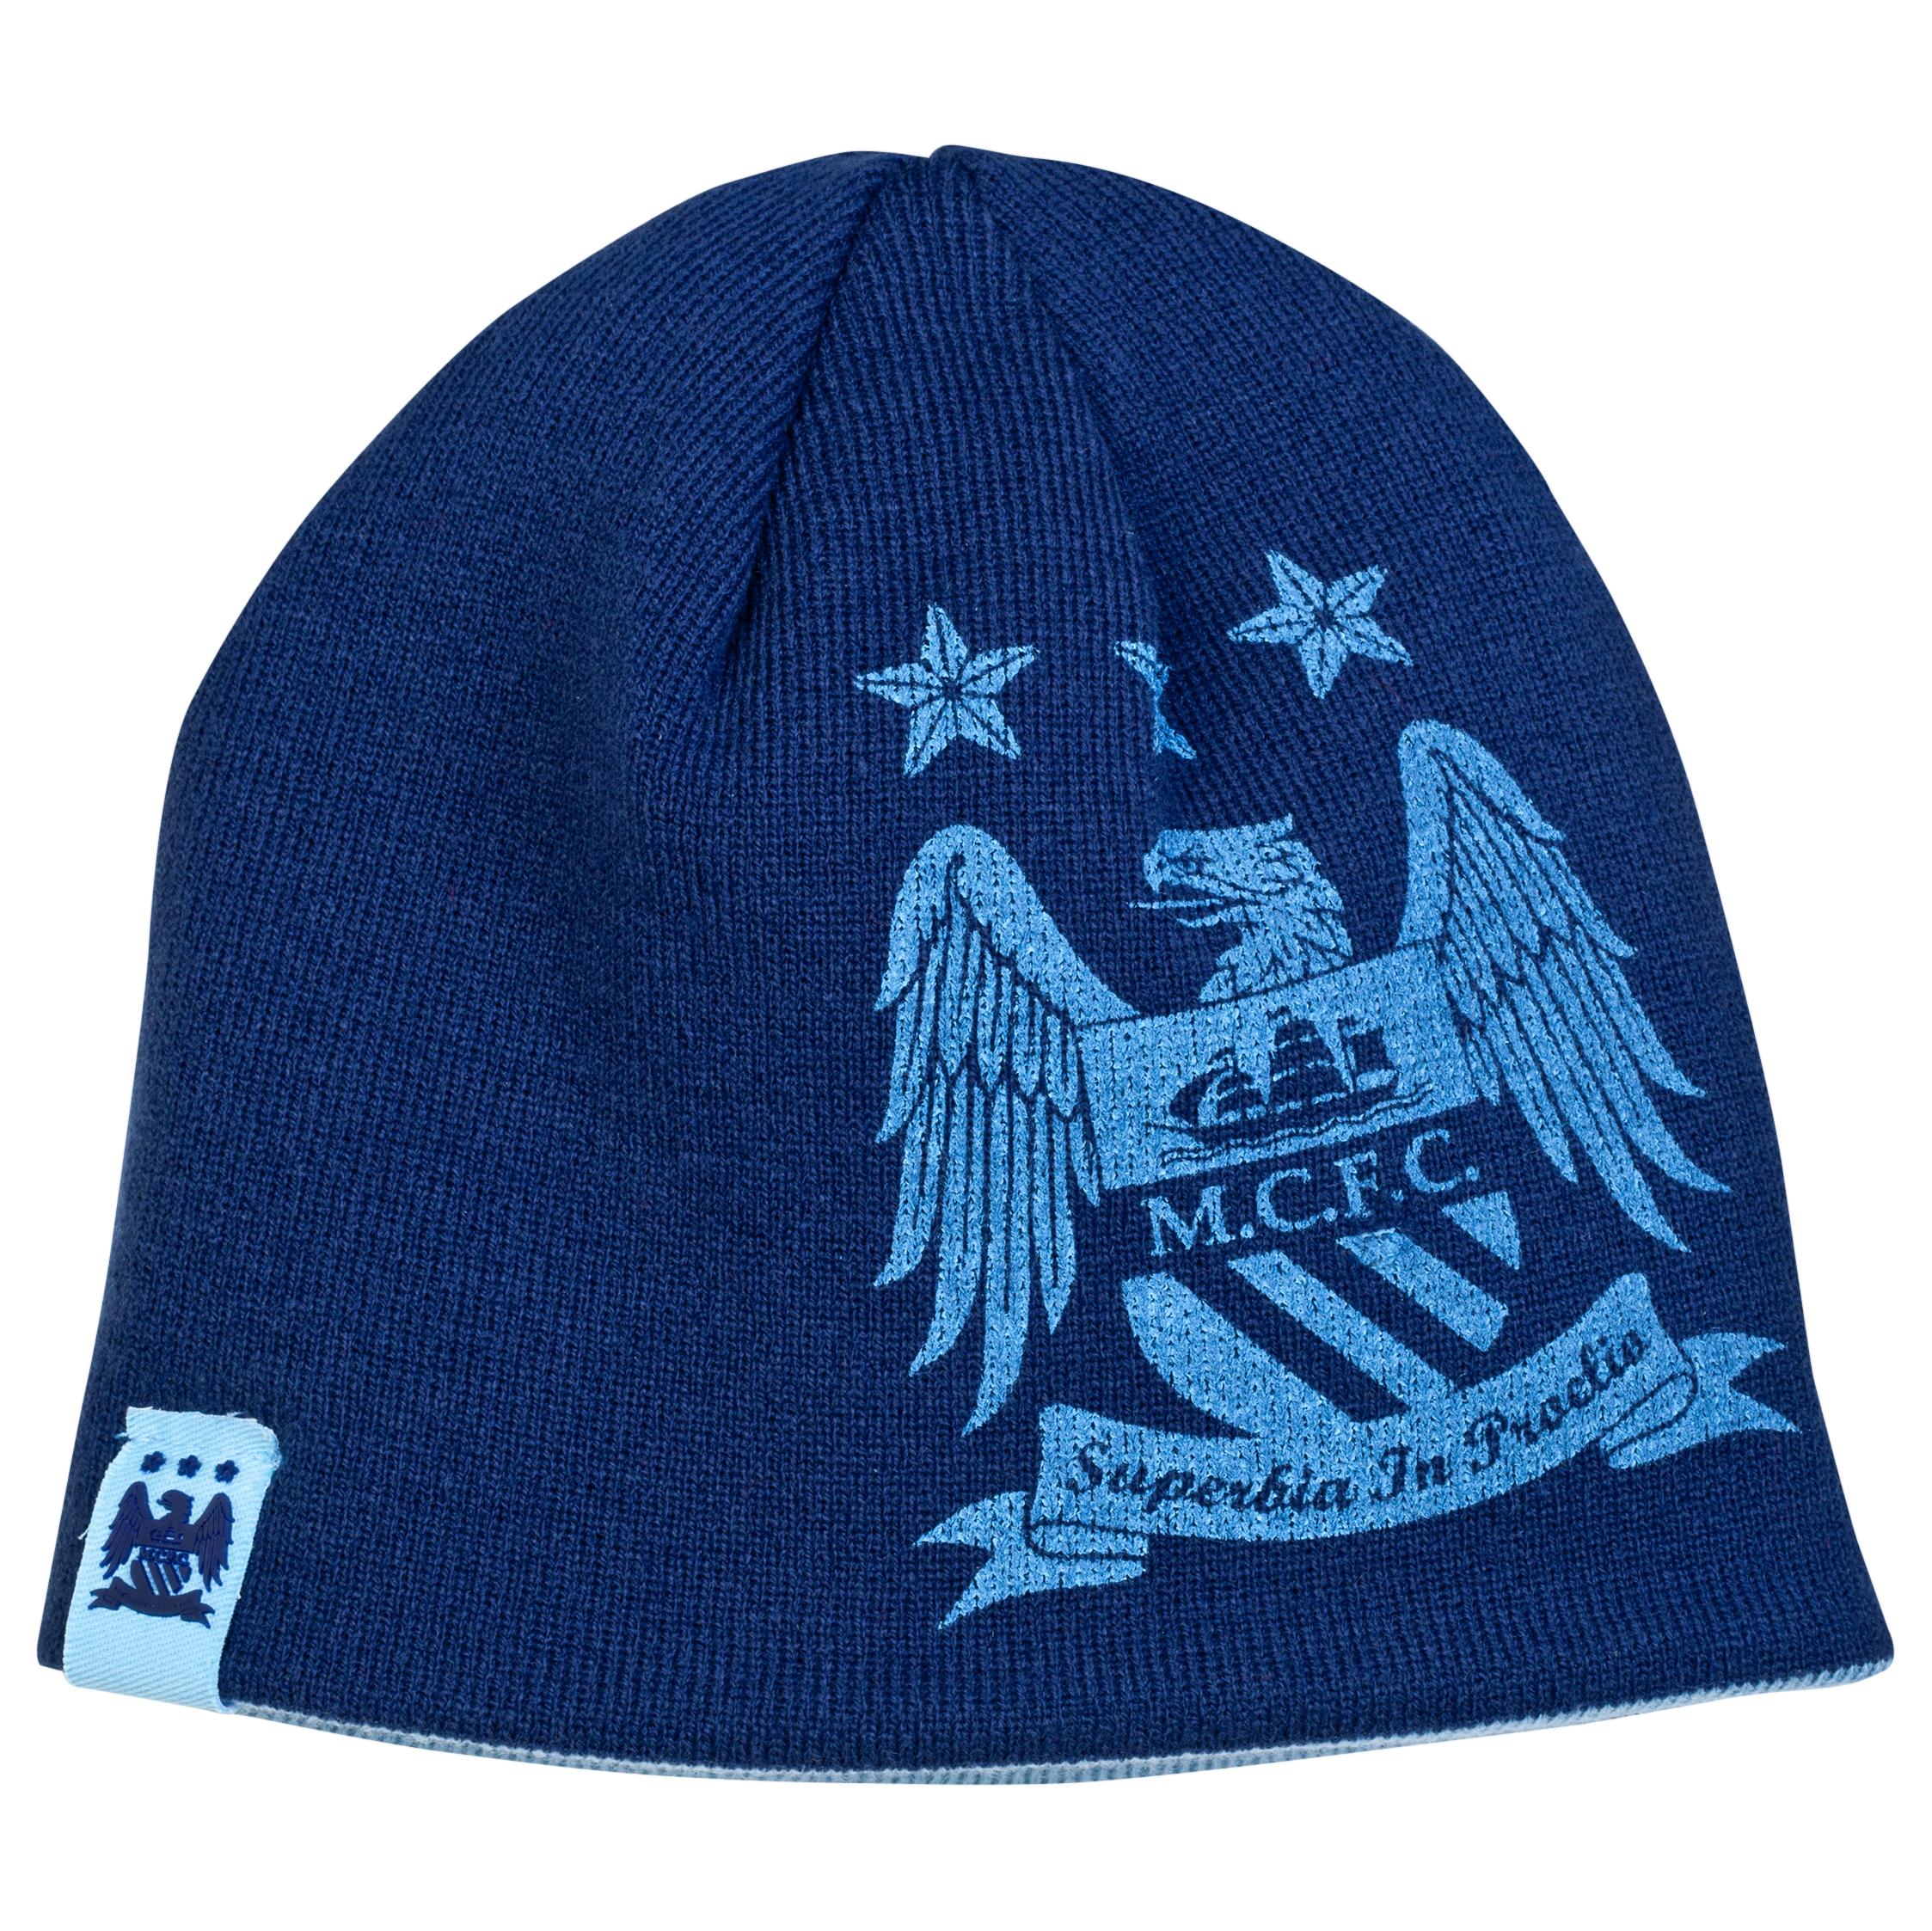 Manchester City Reverse Hat - Sky/Navy - Junior